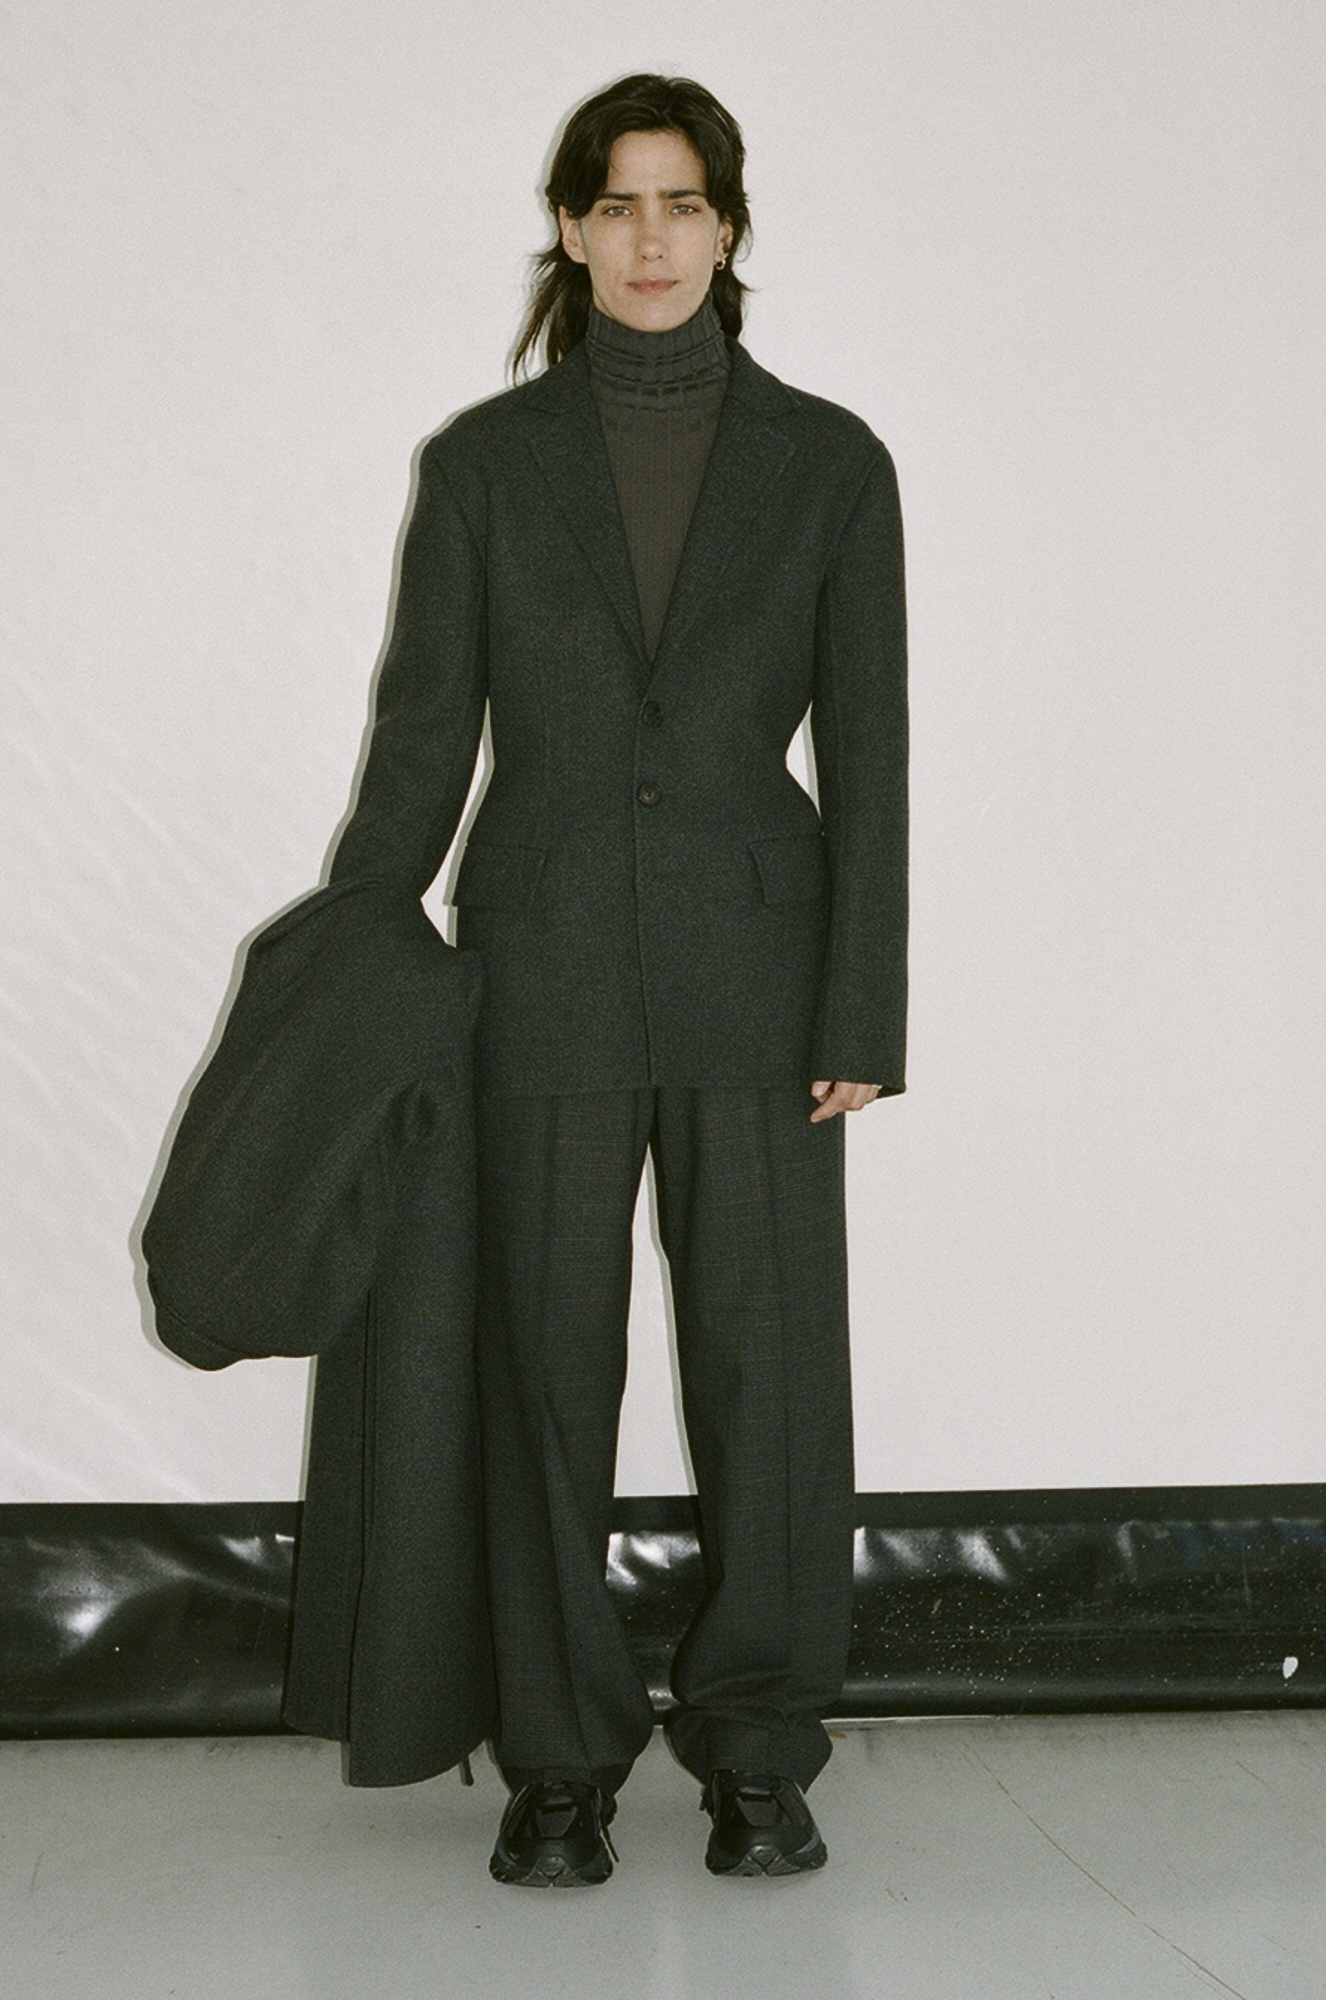 GAUCHERE Fall Winter 2021 Paris Fashion Week LOOK 4 Coat TEDDIE, Jacket TIA, Knit Top TOMOKO, Trousers TIRIE